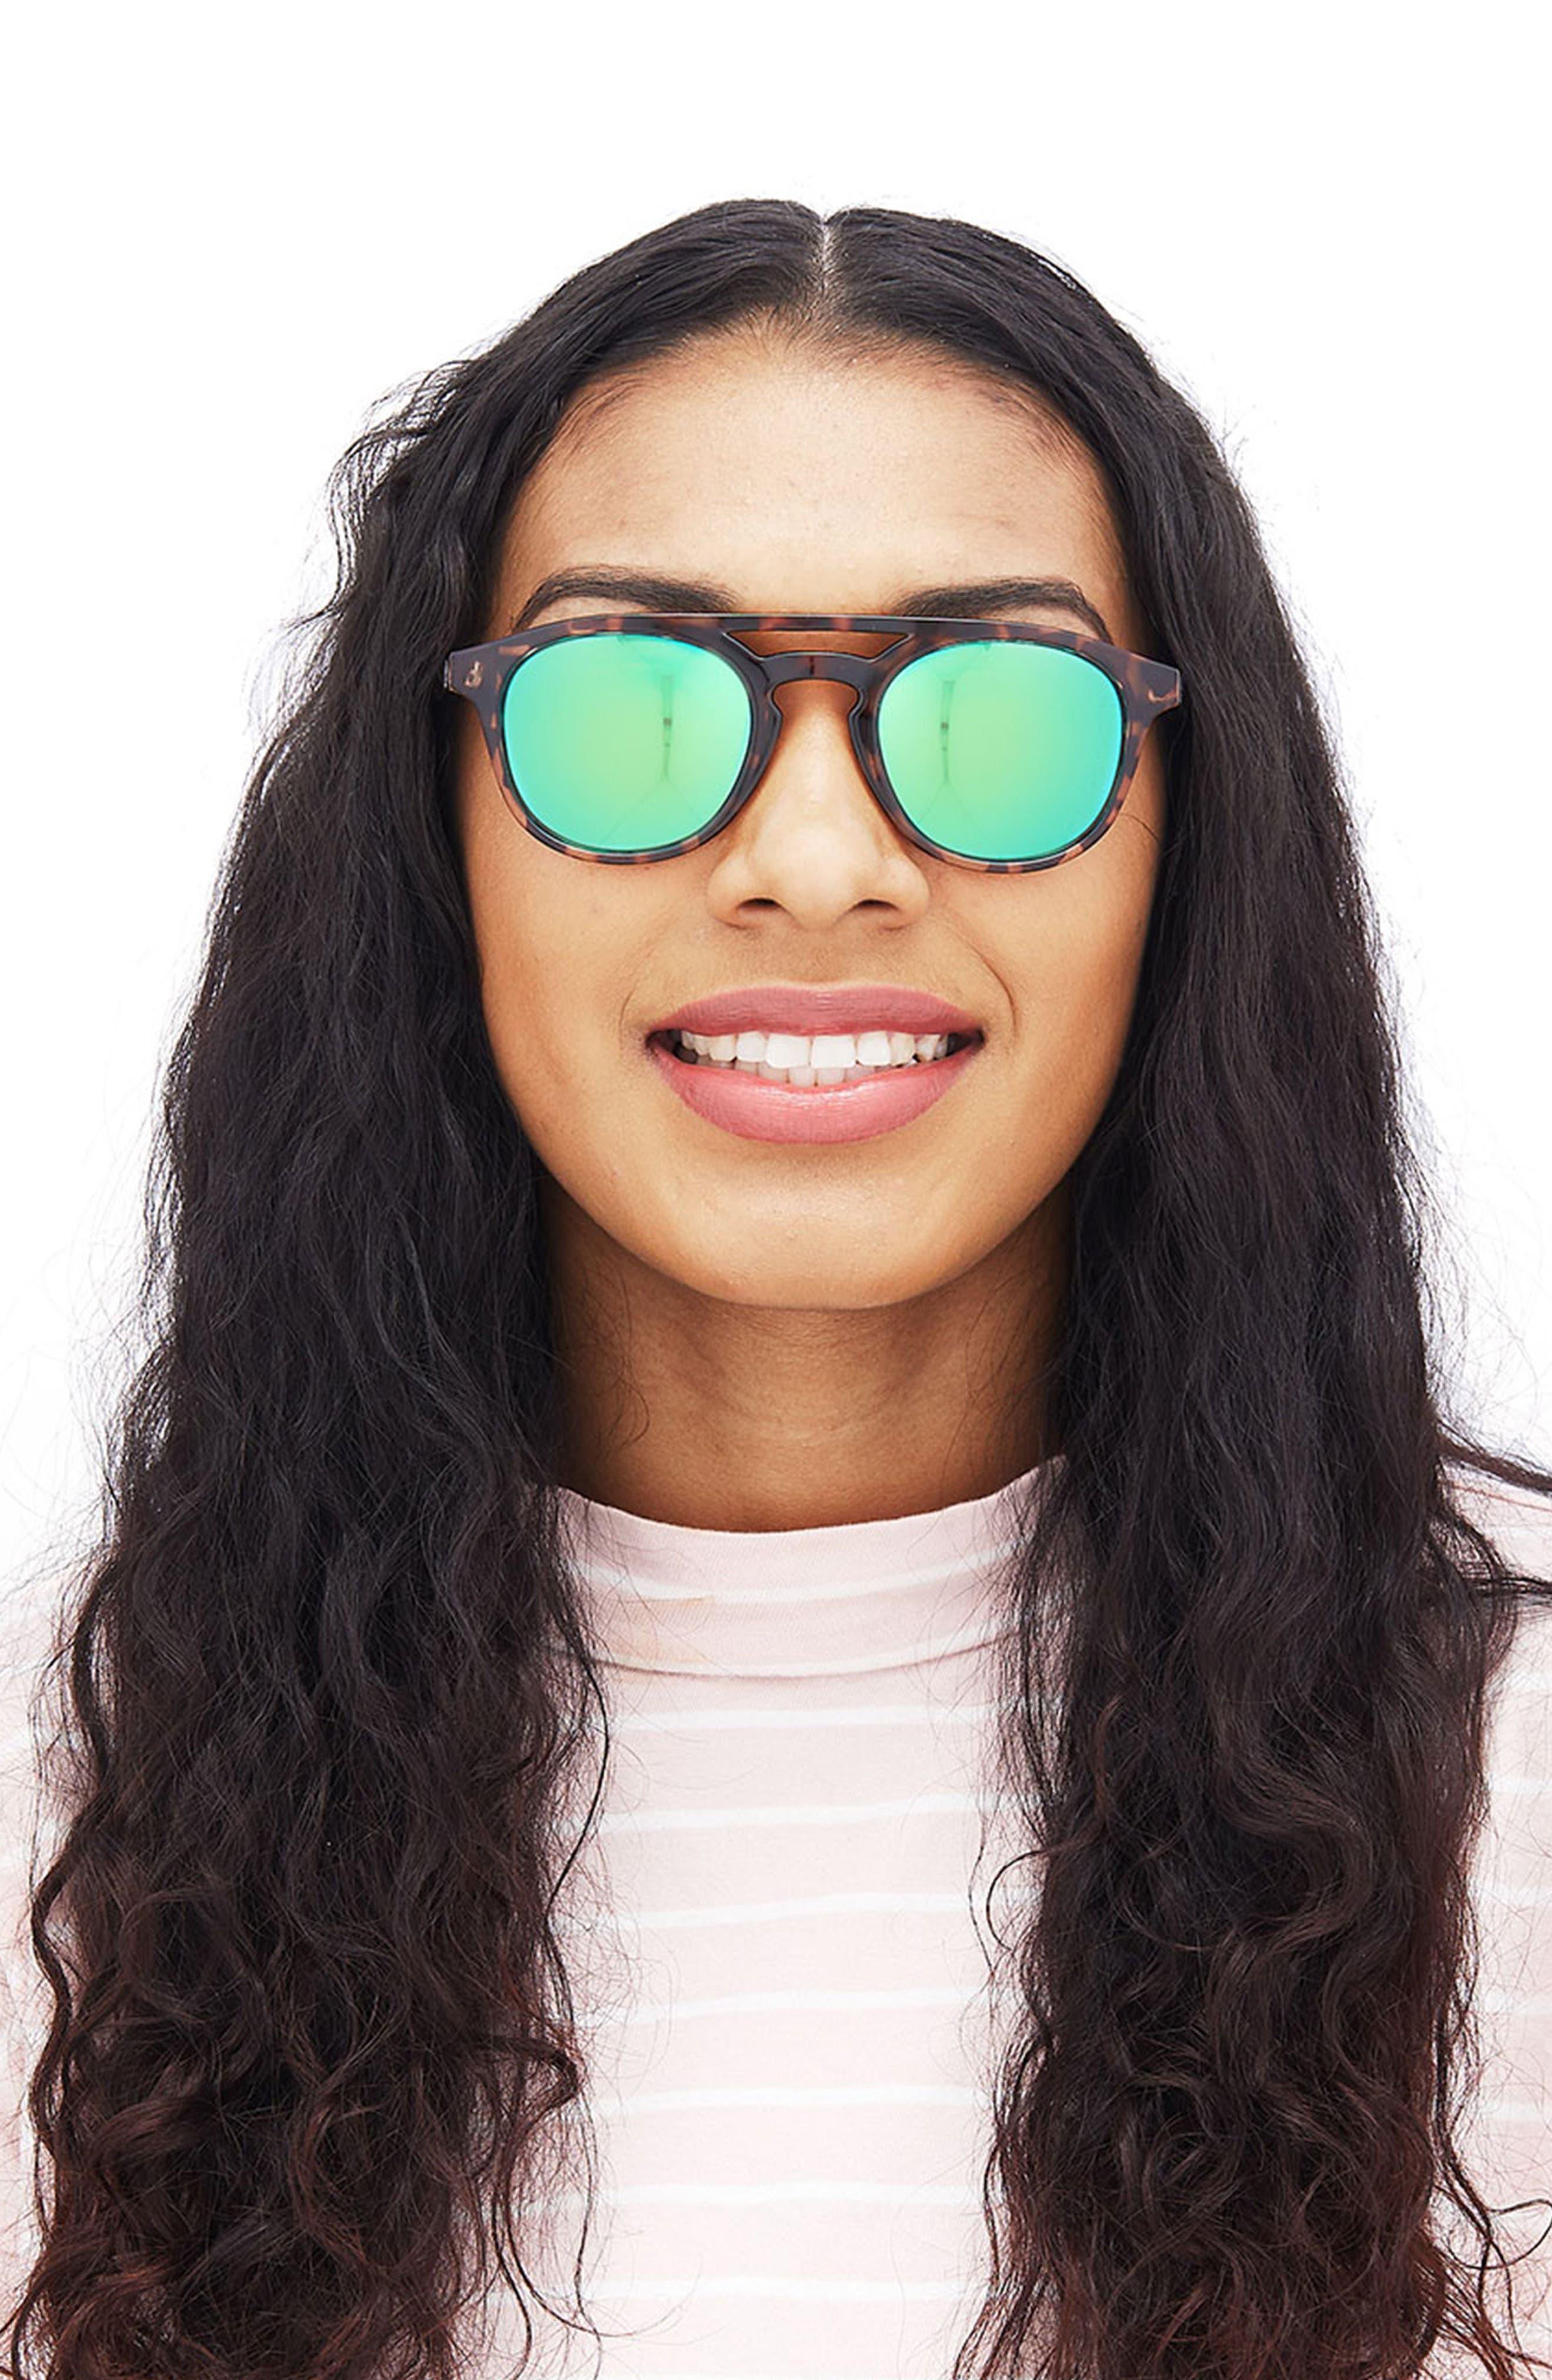 Olema 53mm Polarized Sunglasses,                             Alternate thumbnail 6, color,                             TORTOISE AMBER